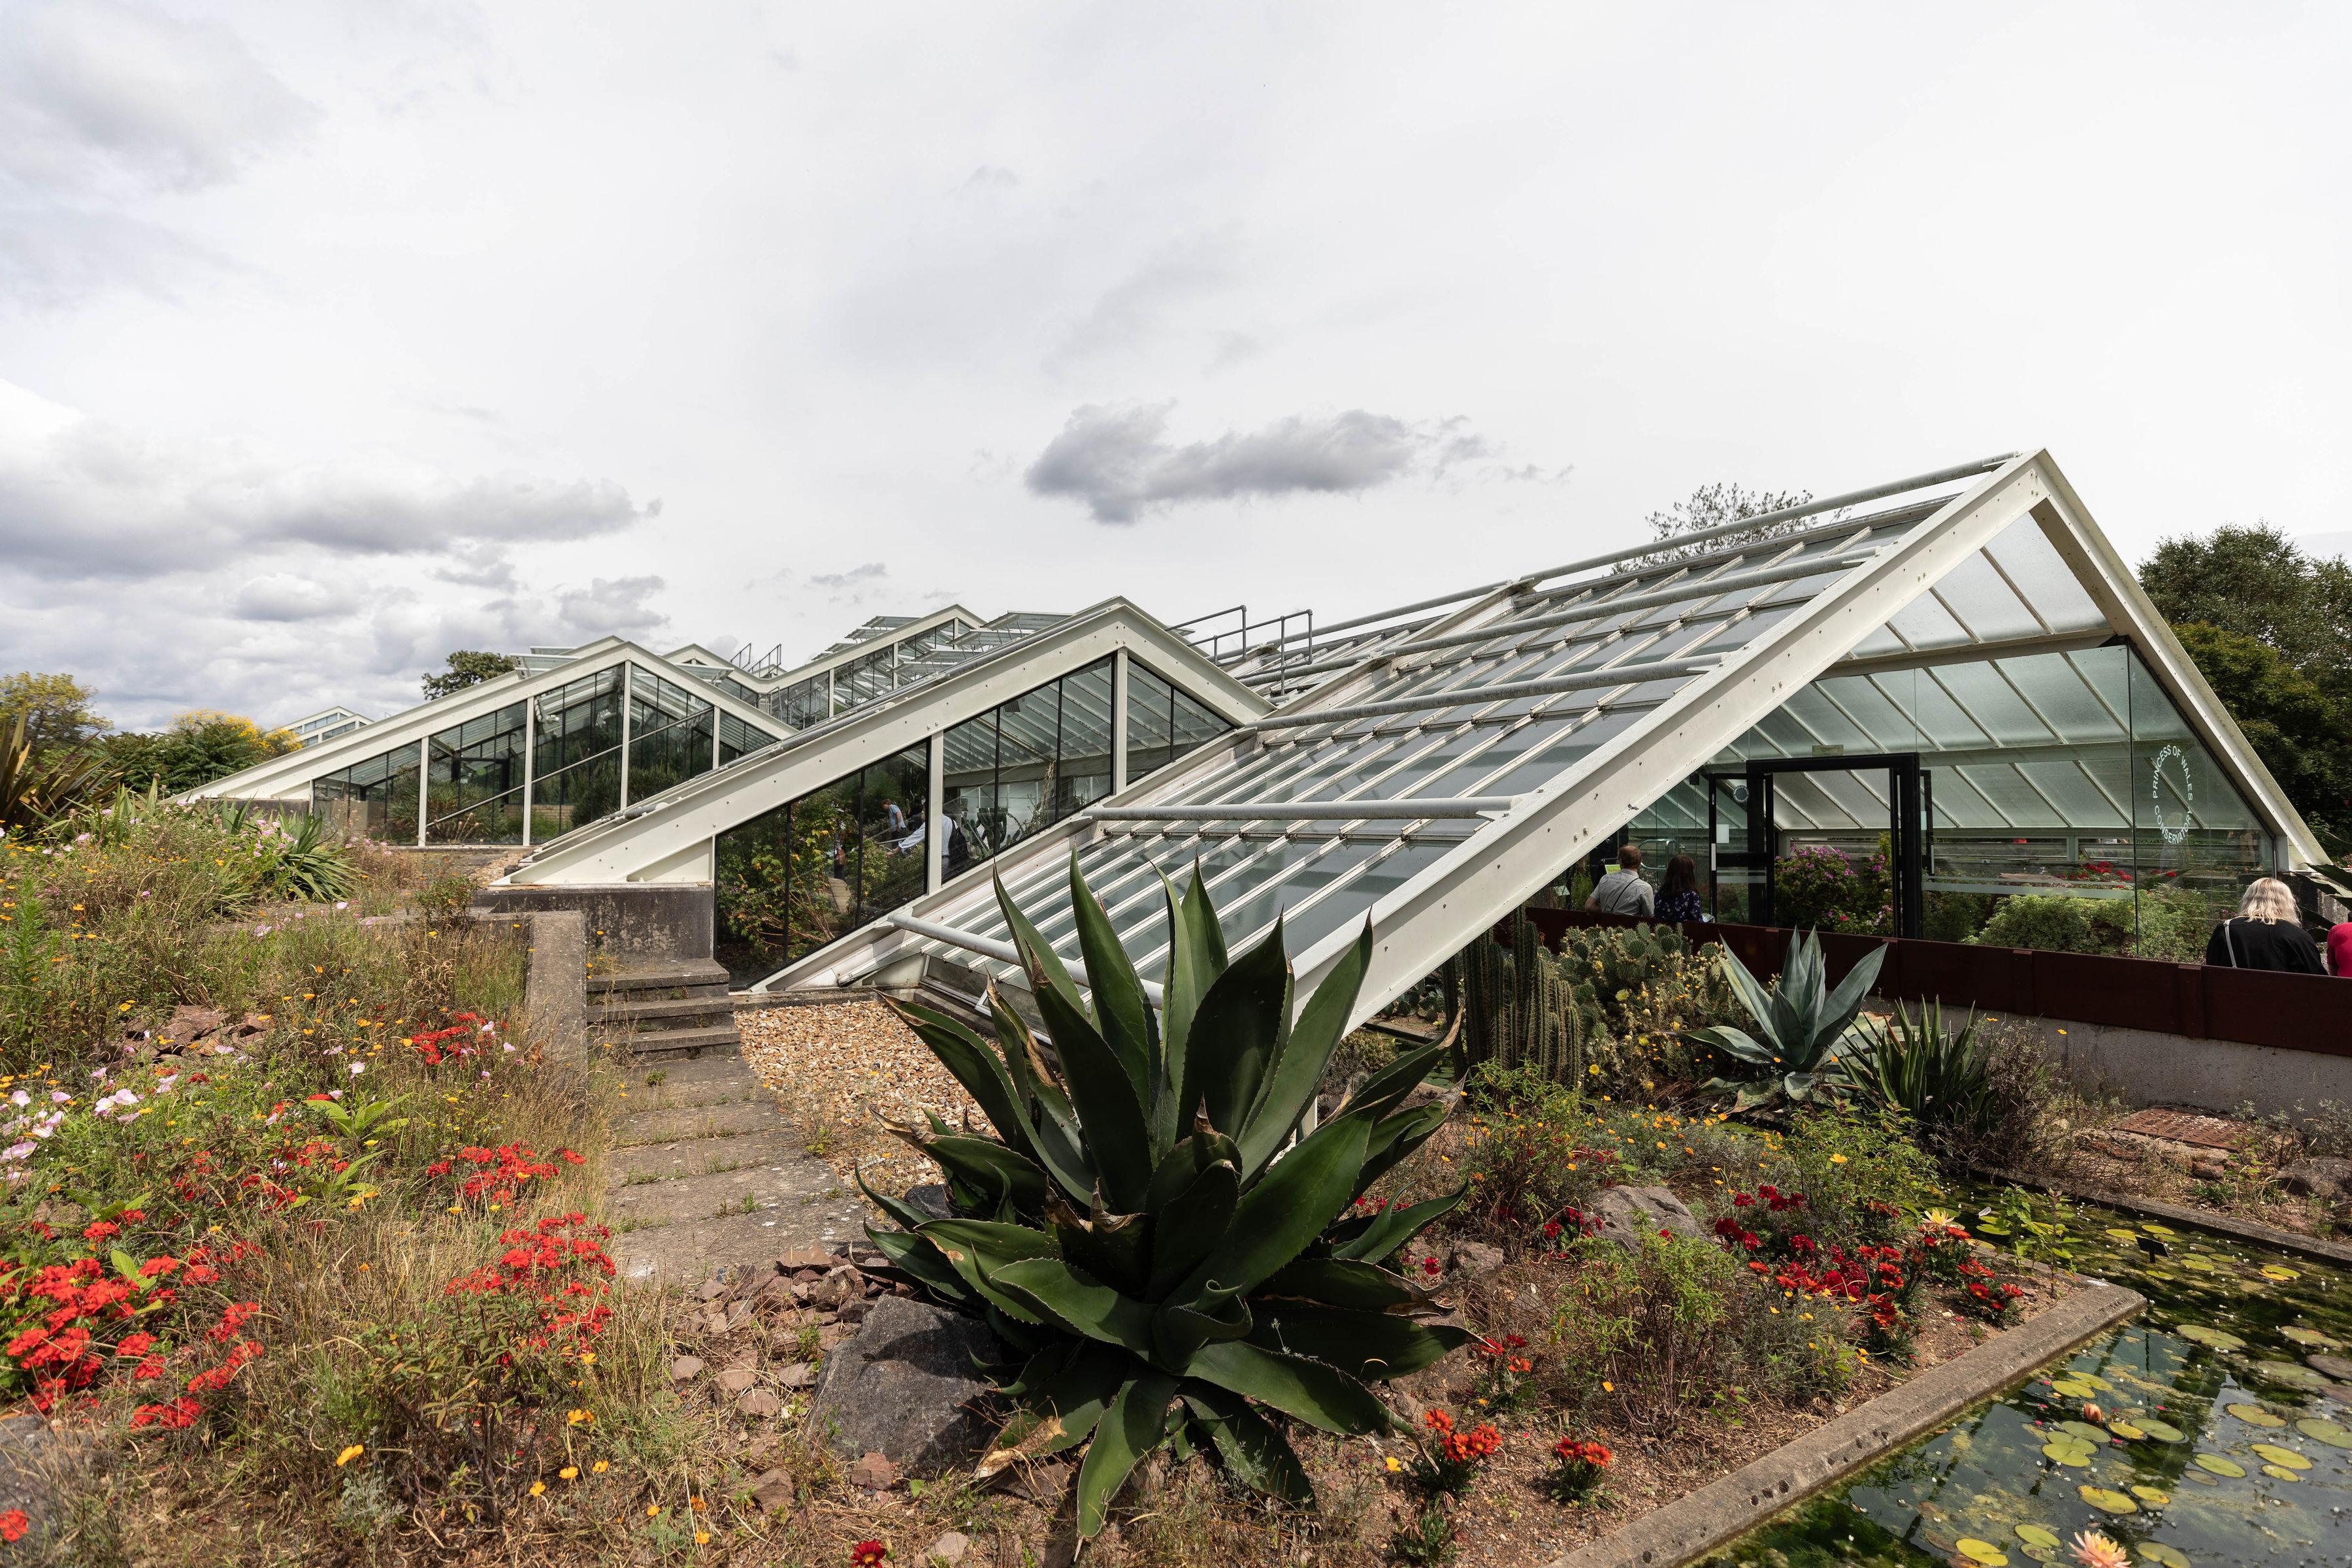 Visiting Kew Royal Botanic Gardens in London, England - Annie Fairfax